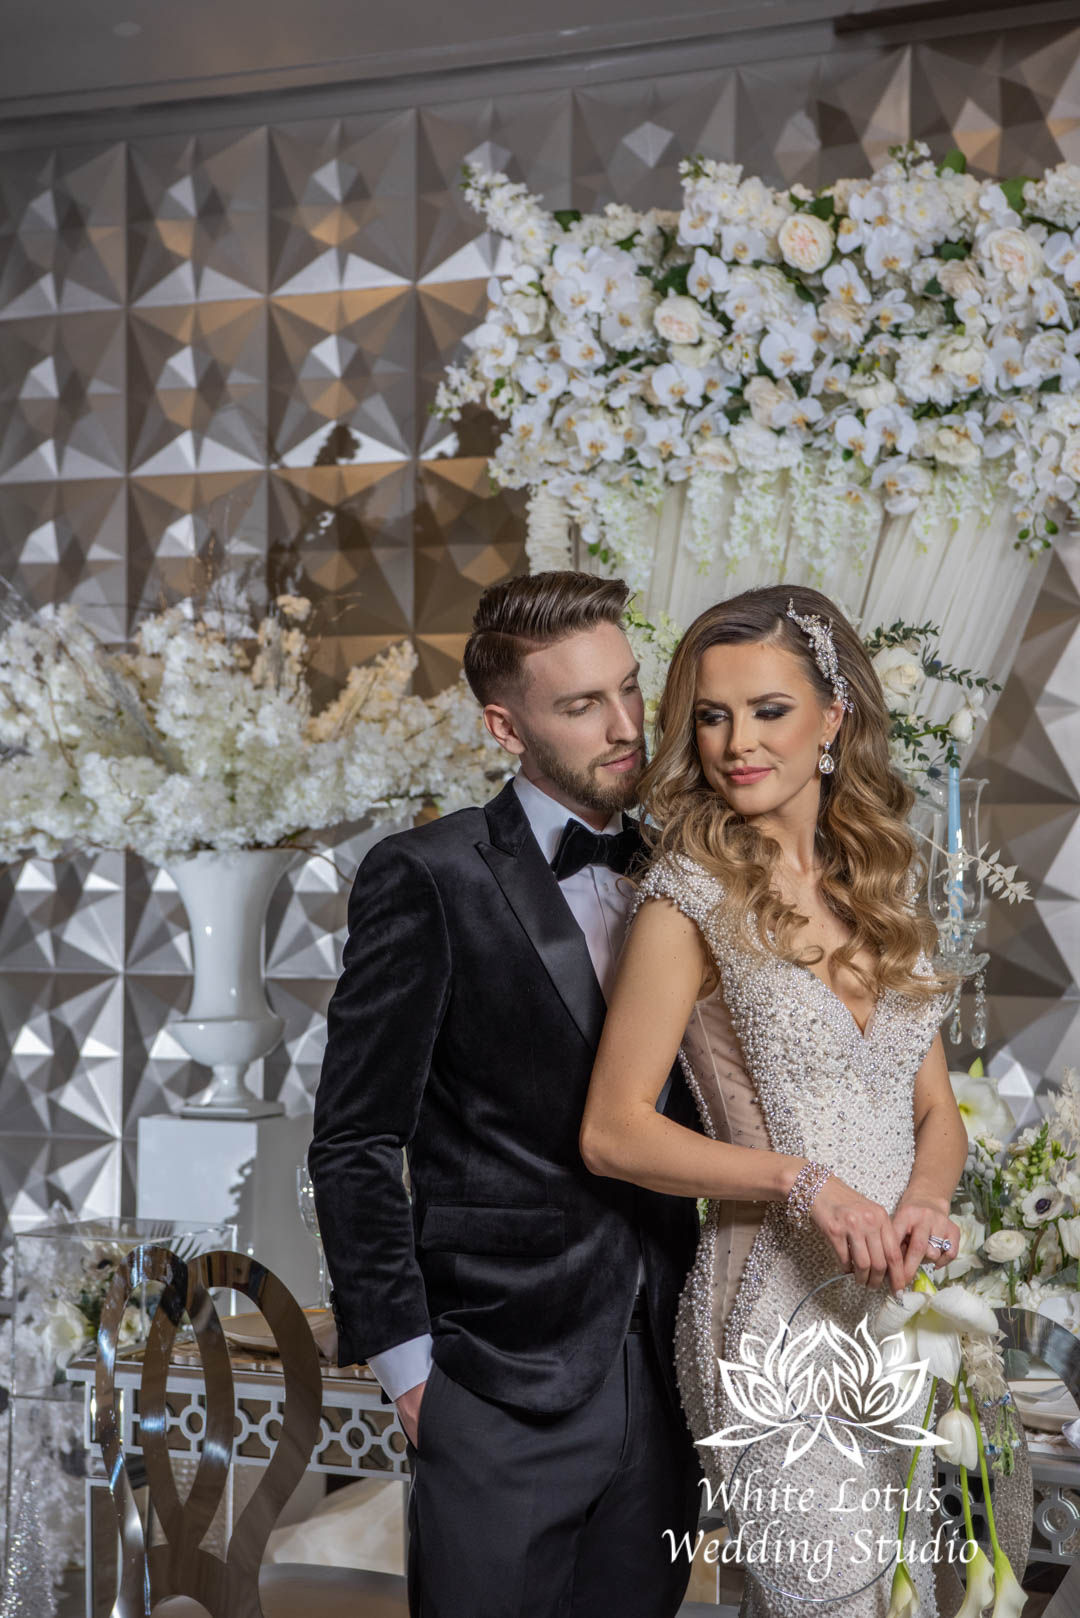 141- GLAM WINTERLUXE WEDDING INSPIRATION